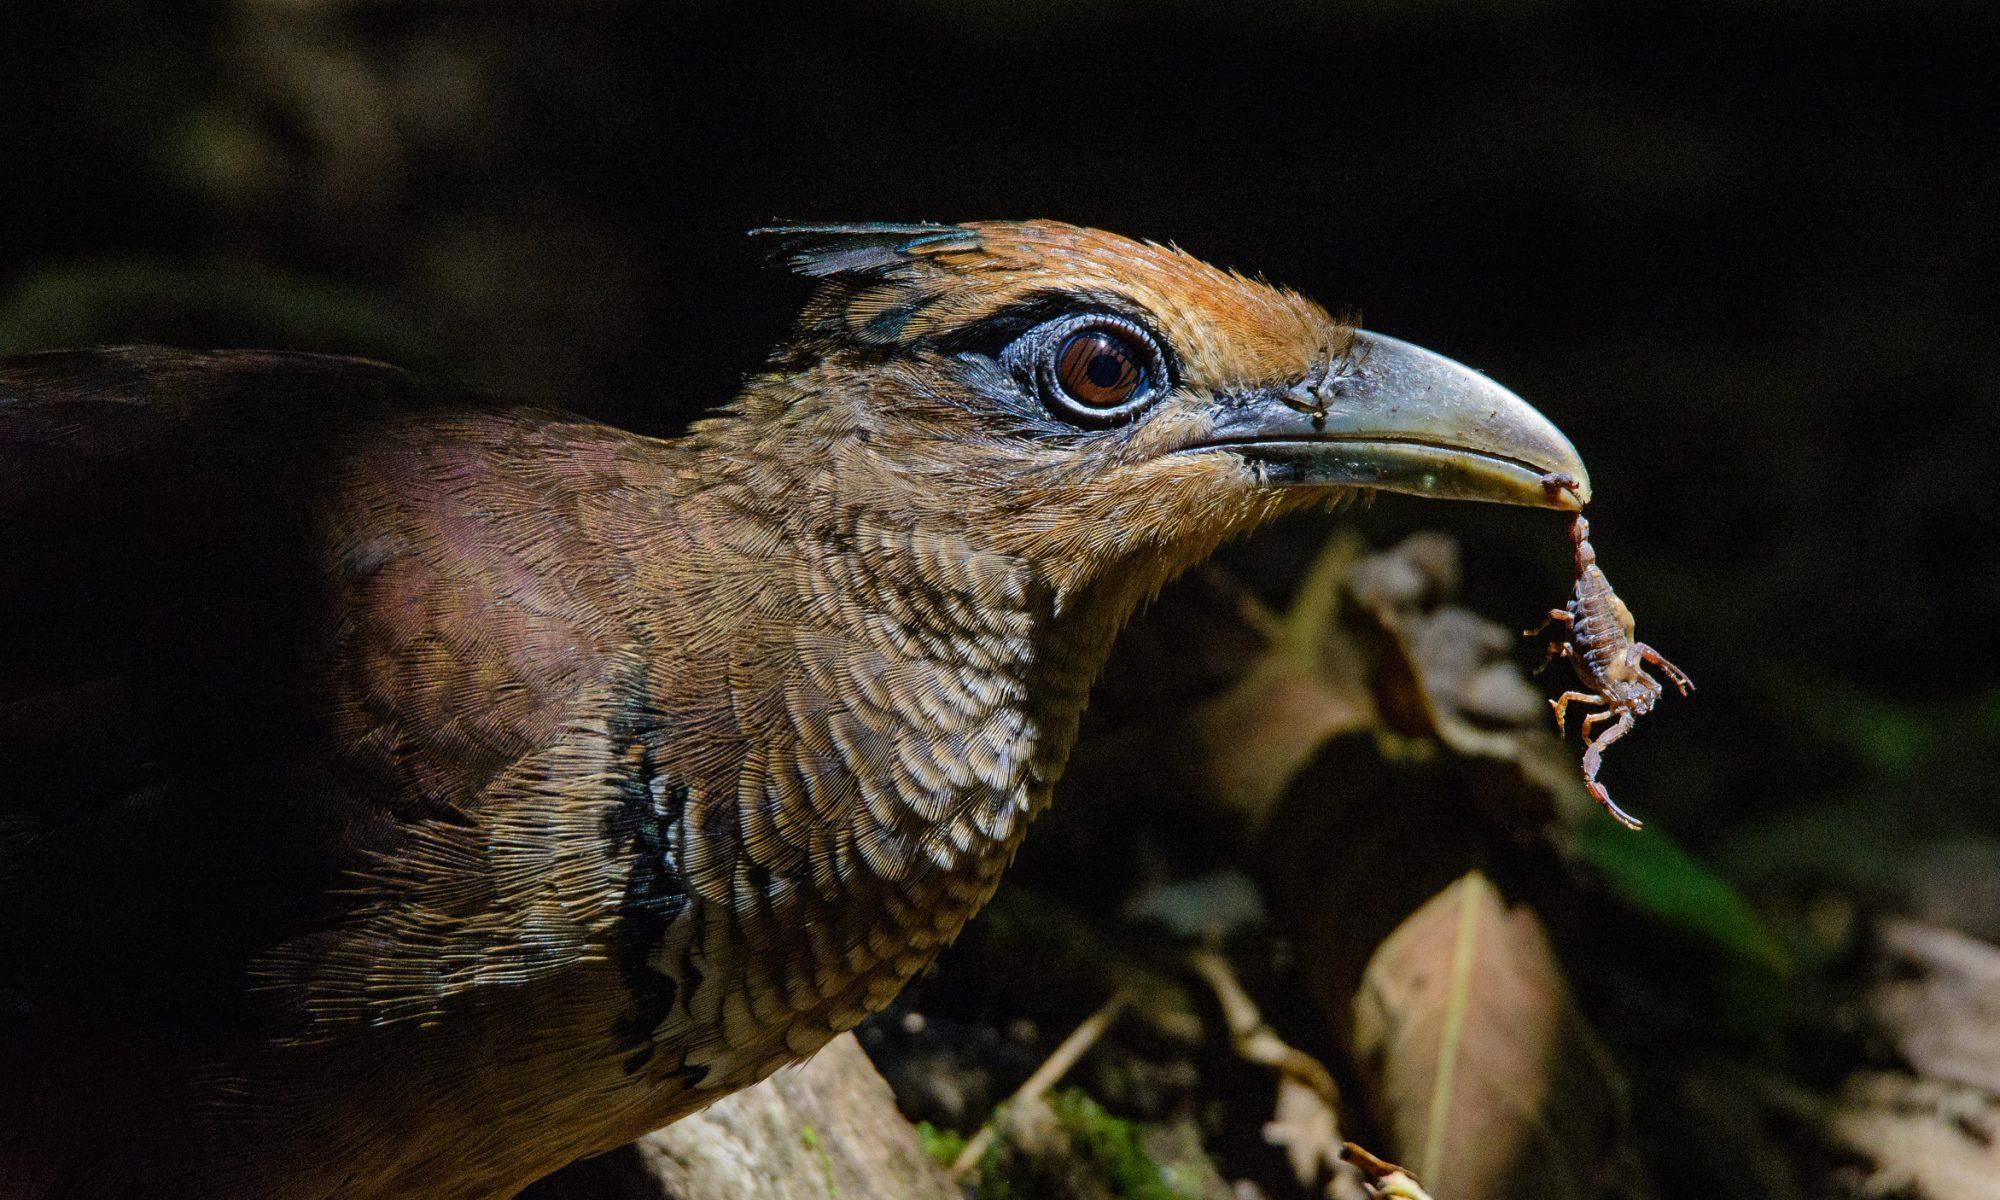 Dylan Vasapolli's birding world